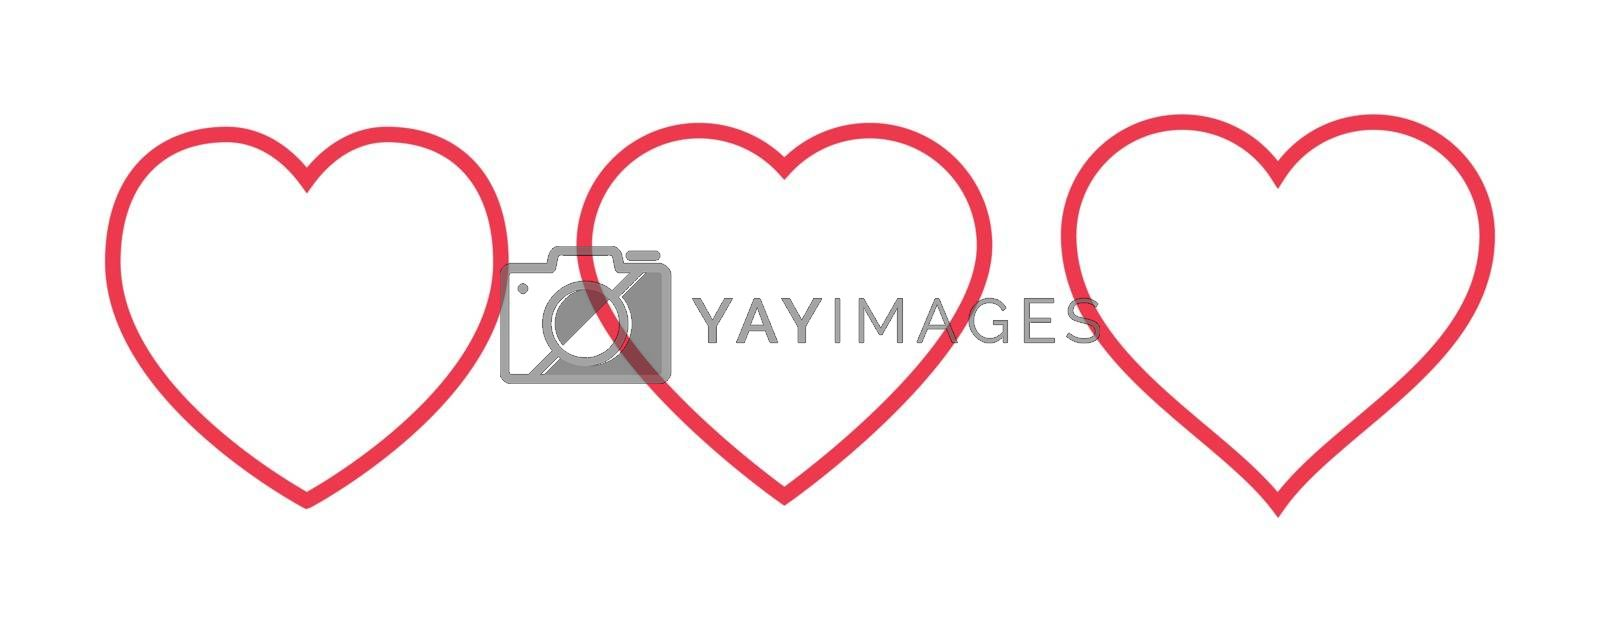 Red heart Icon isolated on white background. Set of love symbol for web site logo, mobile app UI design. Vector illustration outline.